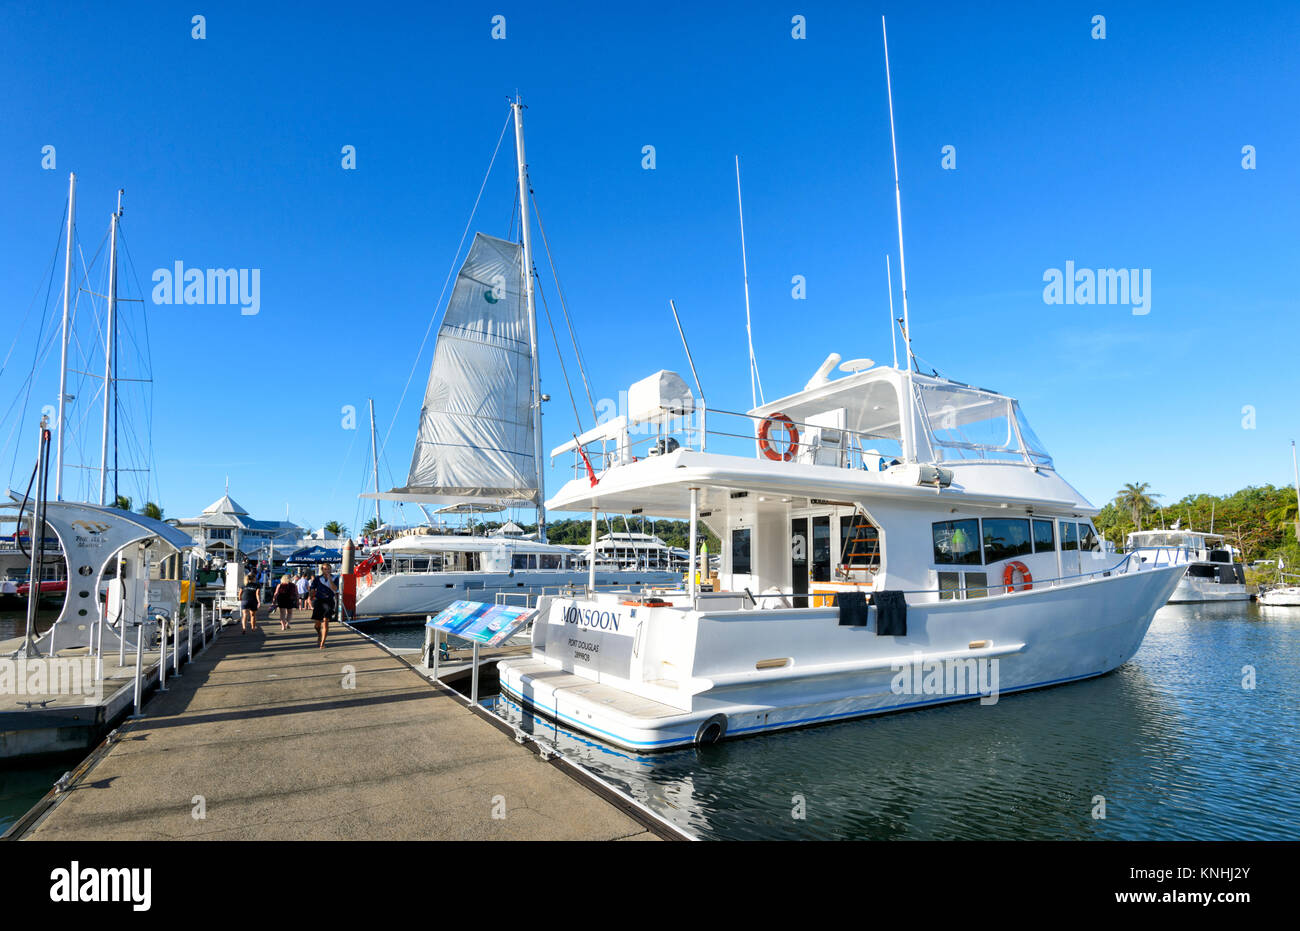 Tourist cruise boats at the Reef Marina, Port Douglas, Far North Queensland, FNQ, QLD, Australia - Stock Image